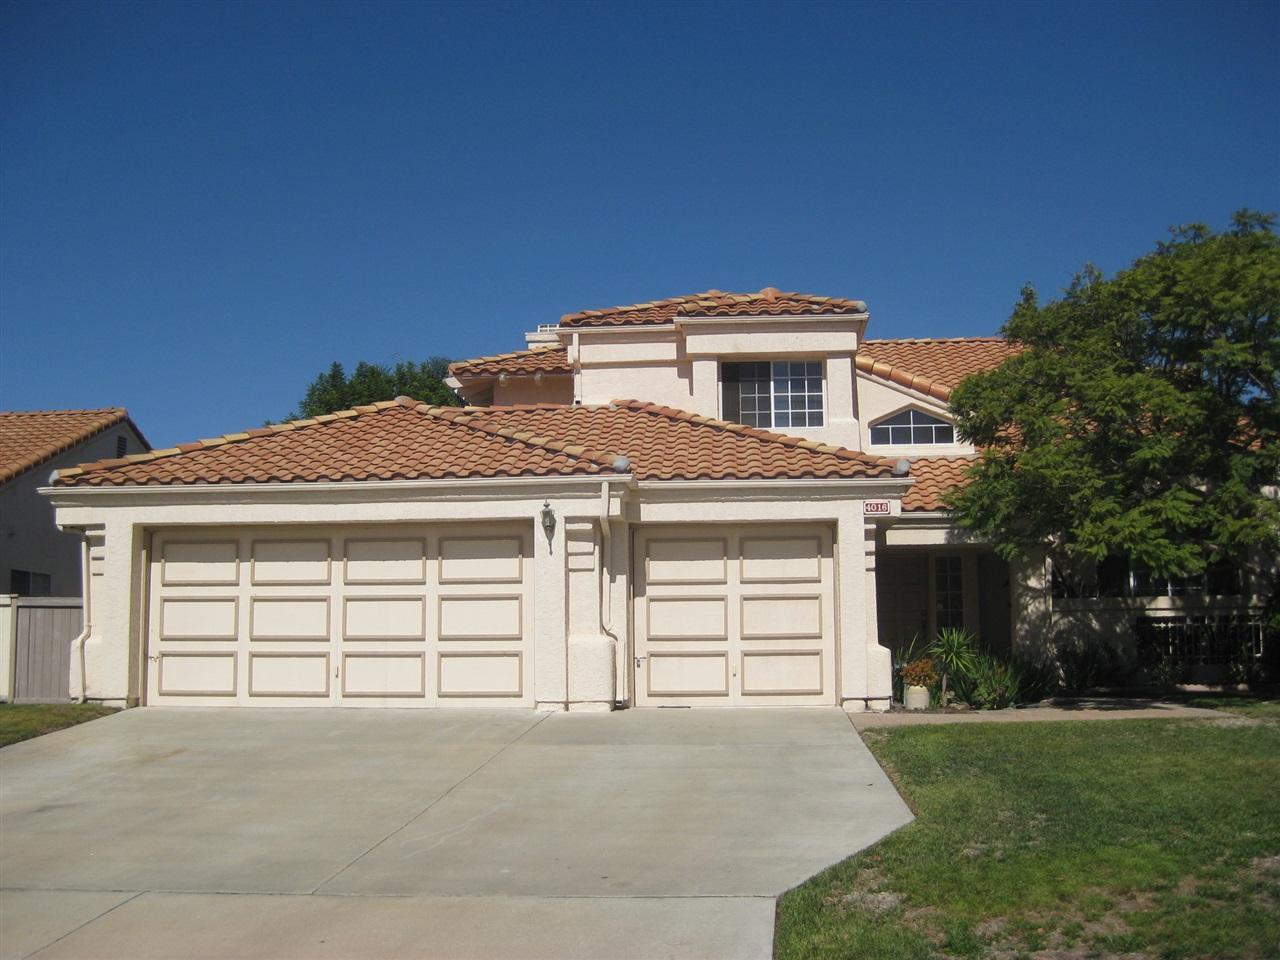 4016 Via De La Paz, Oceanside, CA 92057